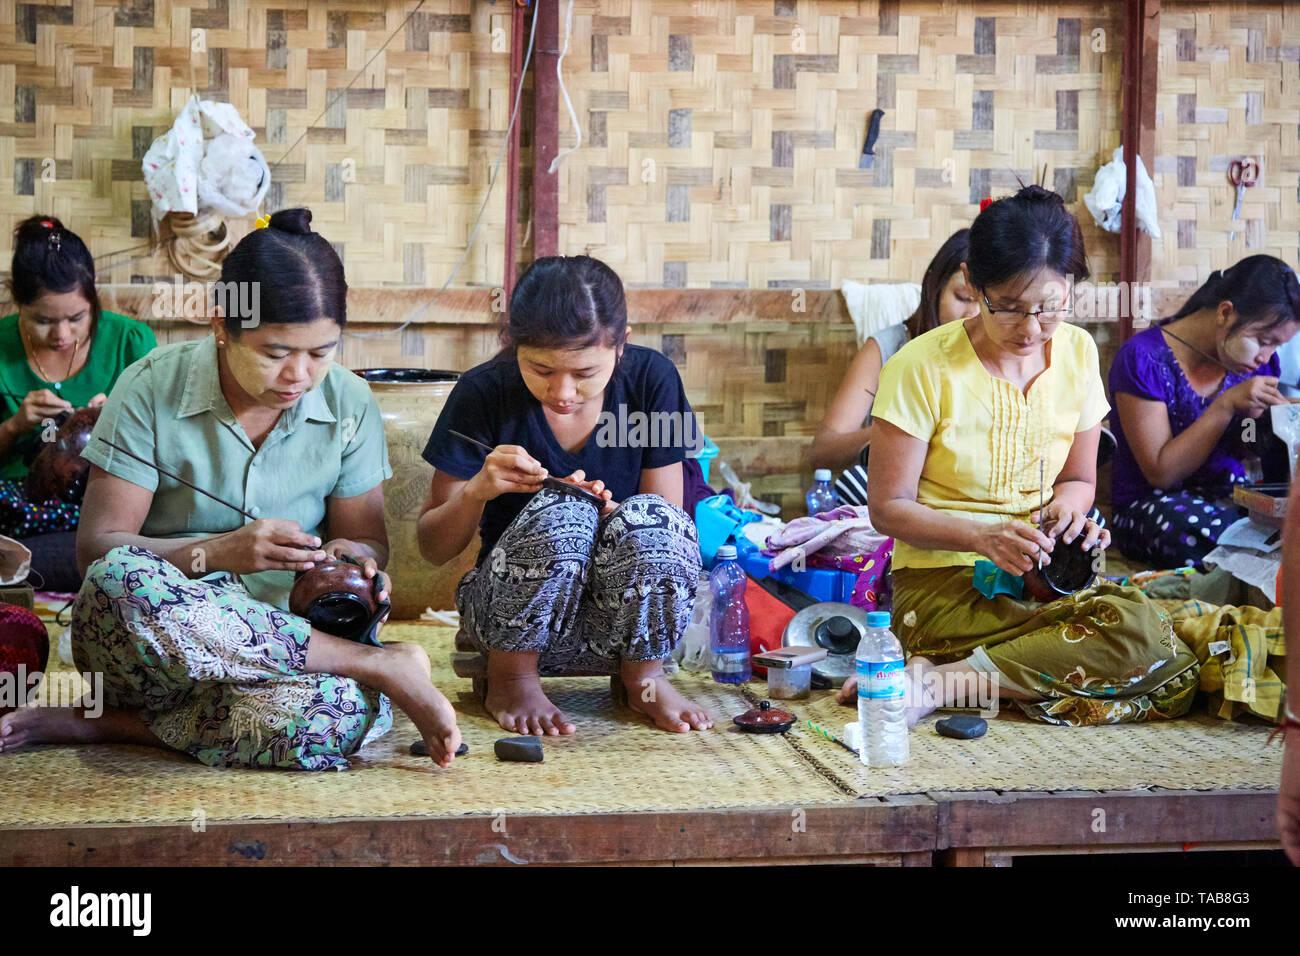 Women working etching designs into enamelware in marketplace in Bagan, Myanmar. - Stock Image